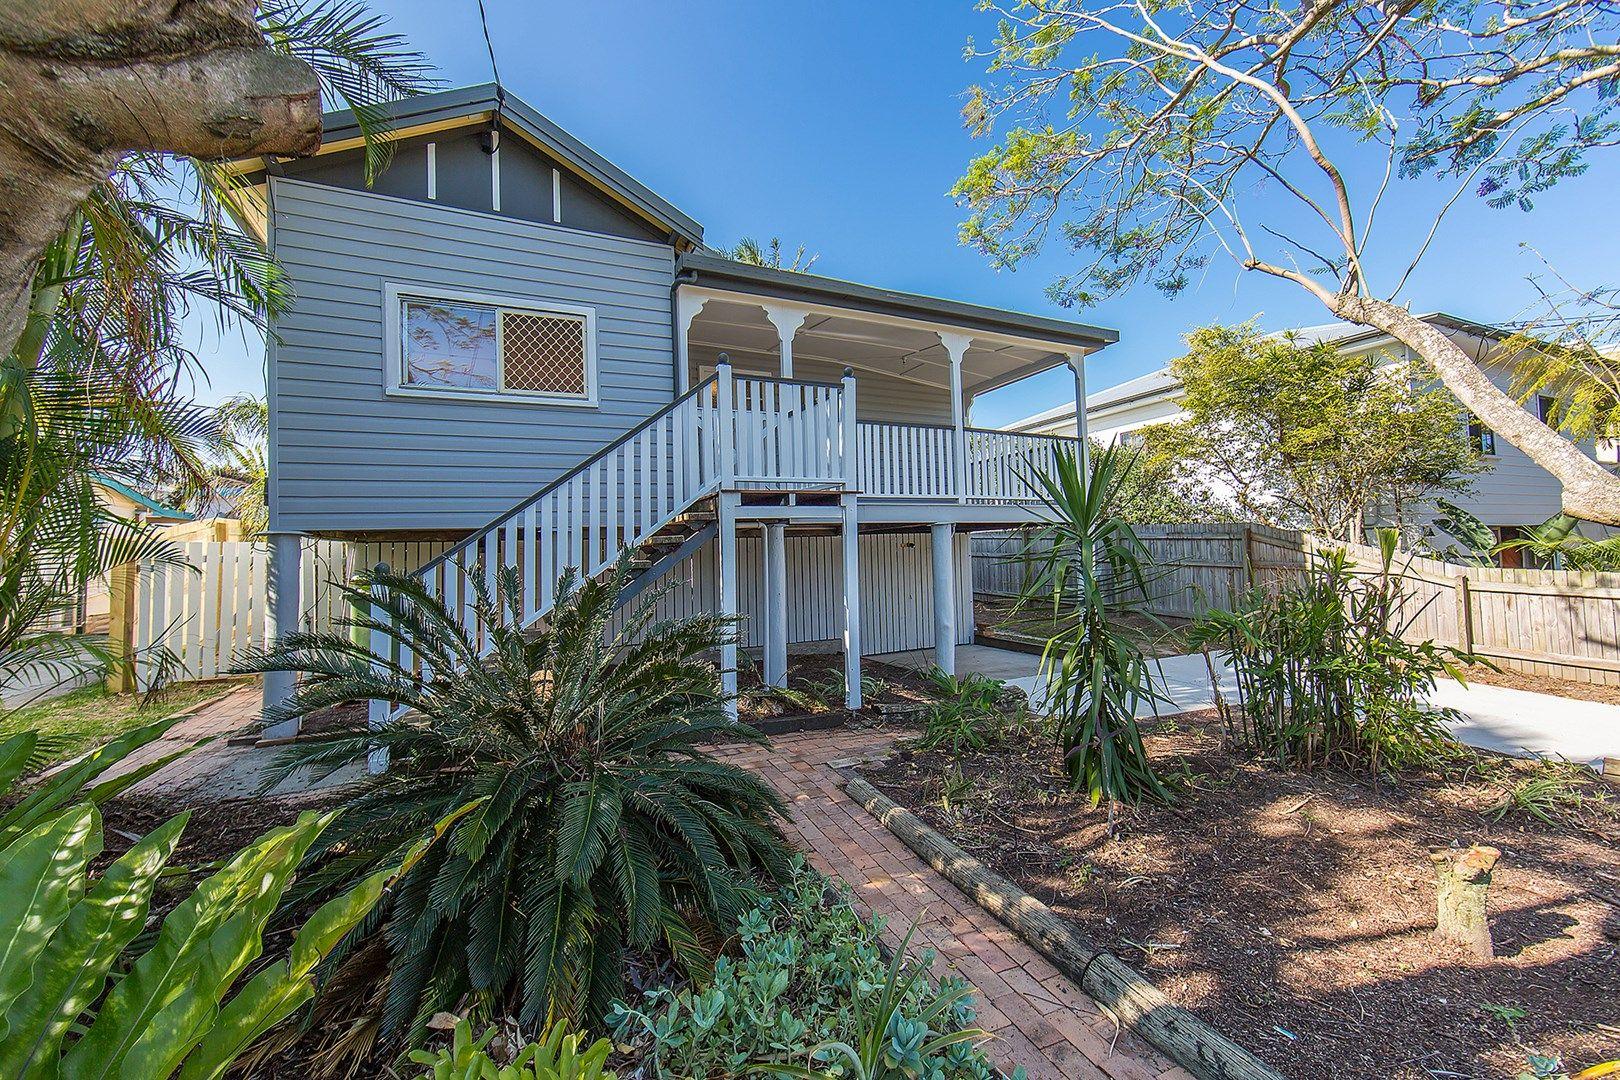 54 Cowen Street, Margate QLD 4019, Image 0